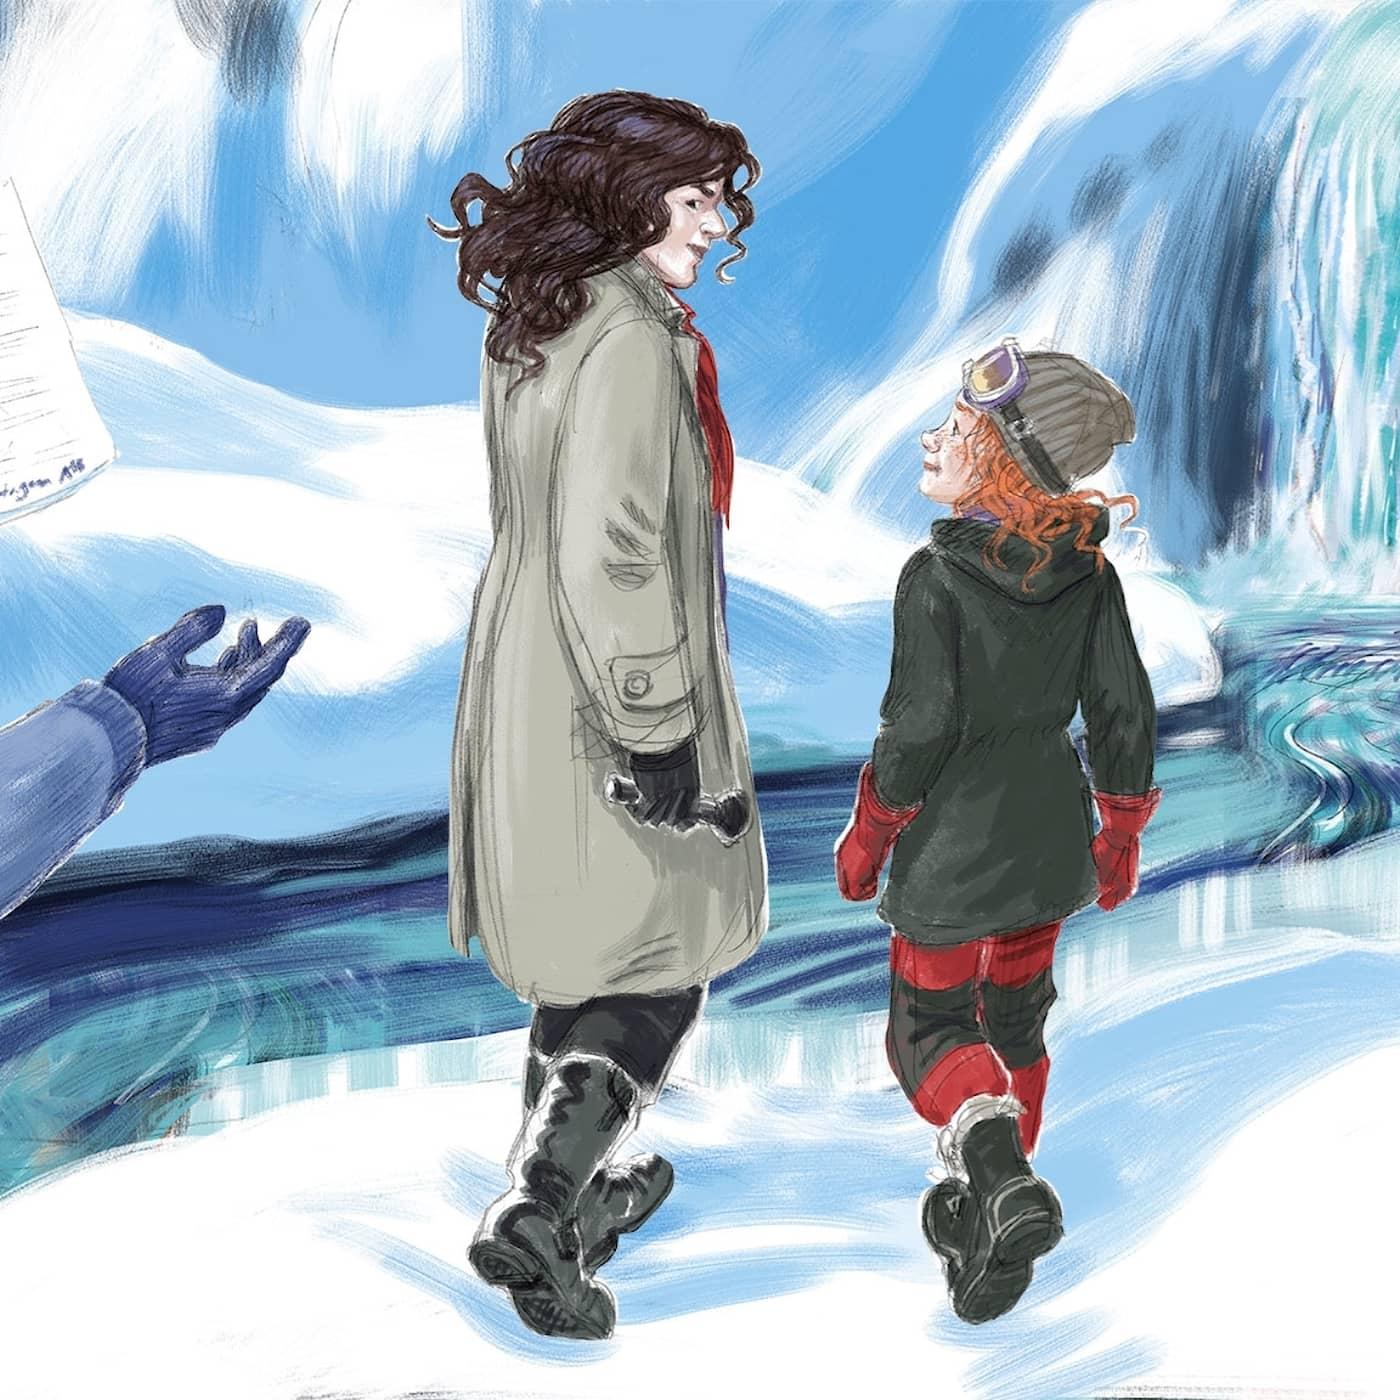 Julkalendern 2018: Tonje i Glimmerdalen